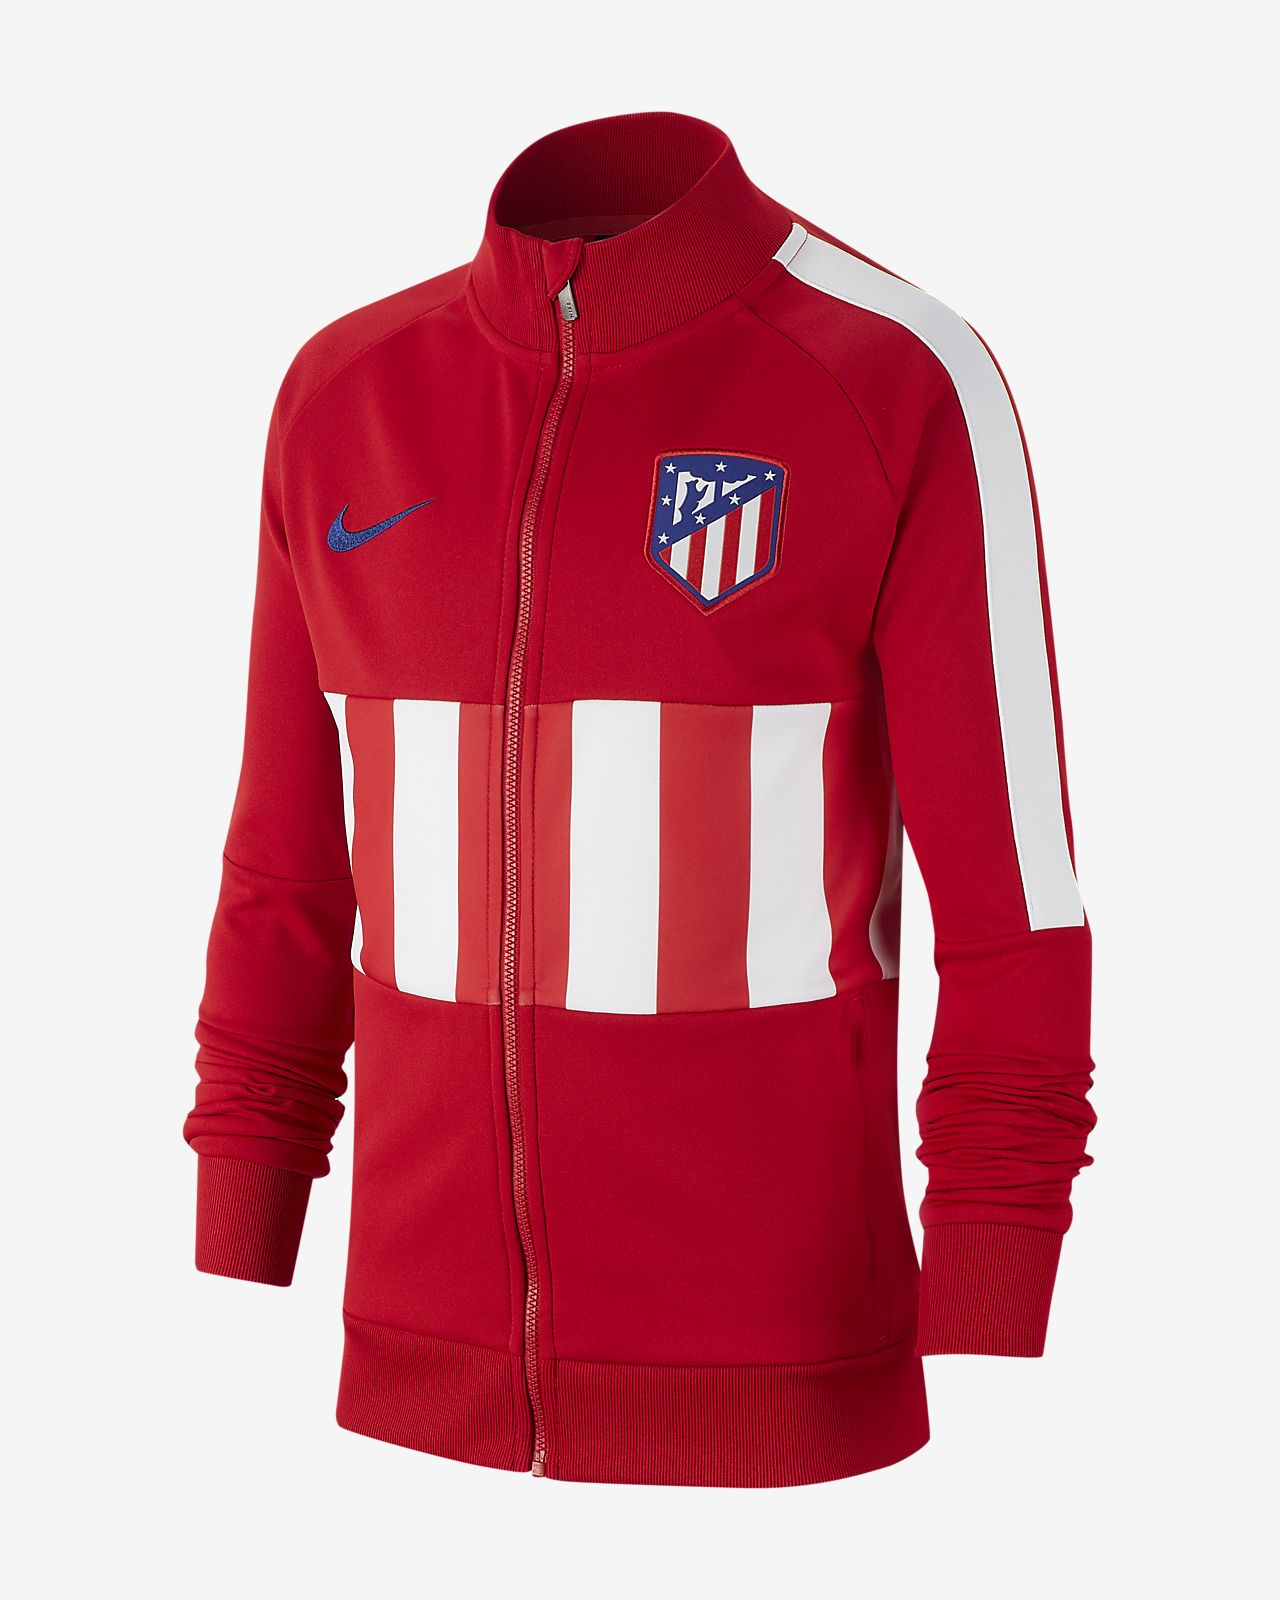 Giacca Atlético de Madrid - Ragazzi